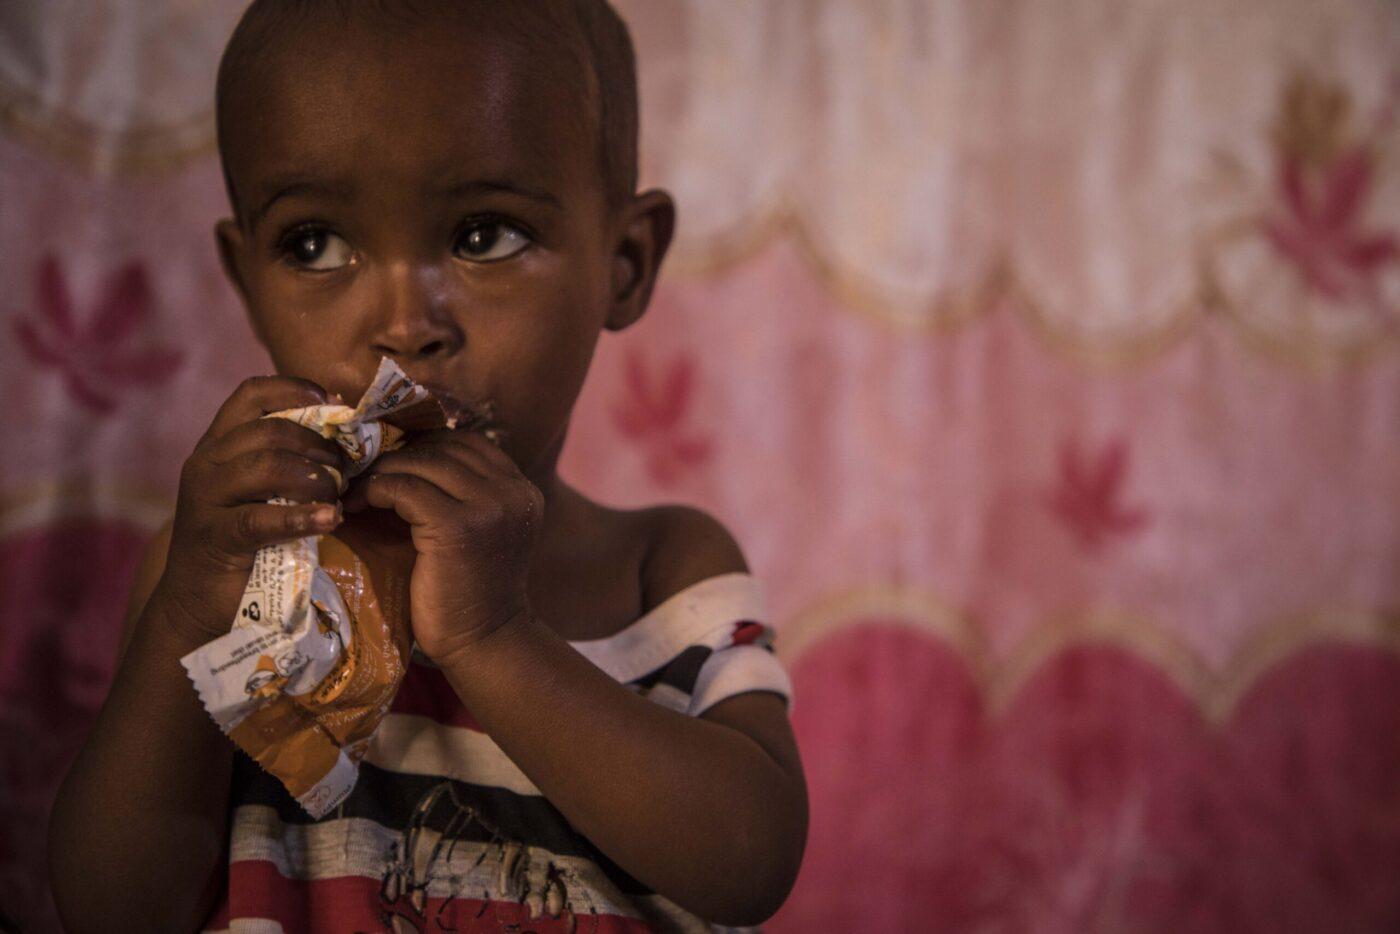 little boy eating nutrition bar